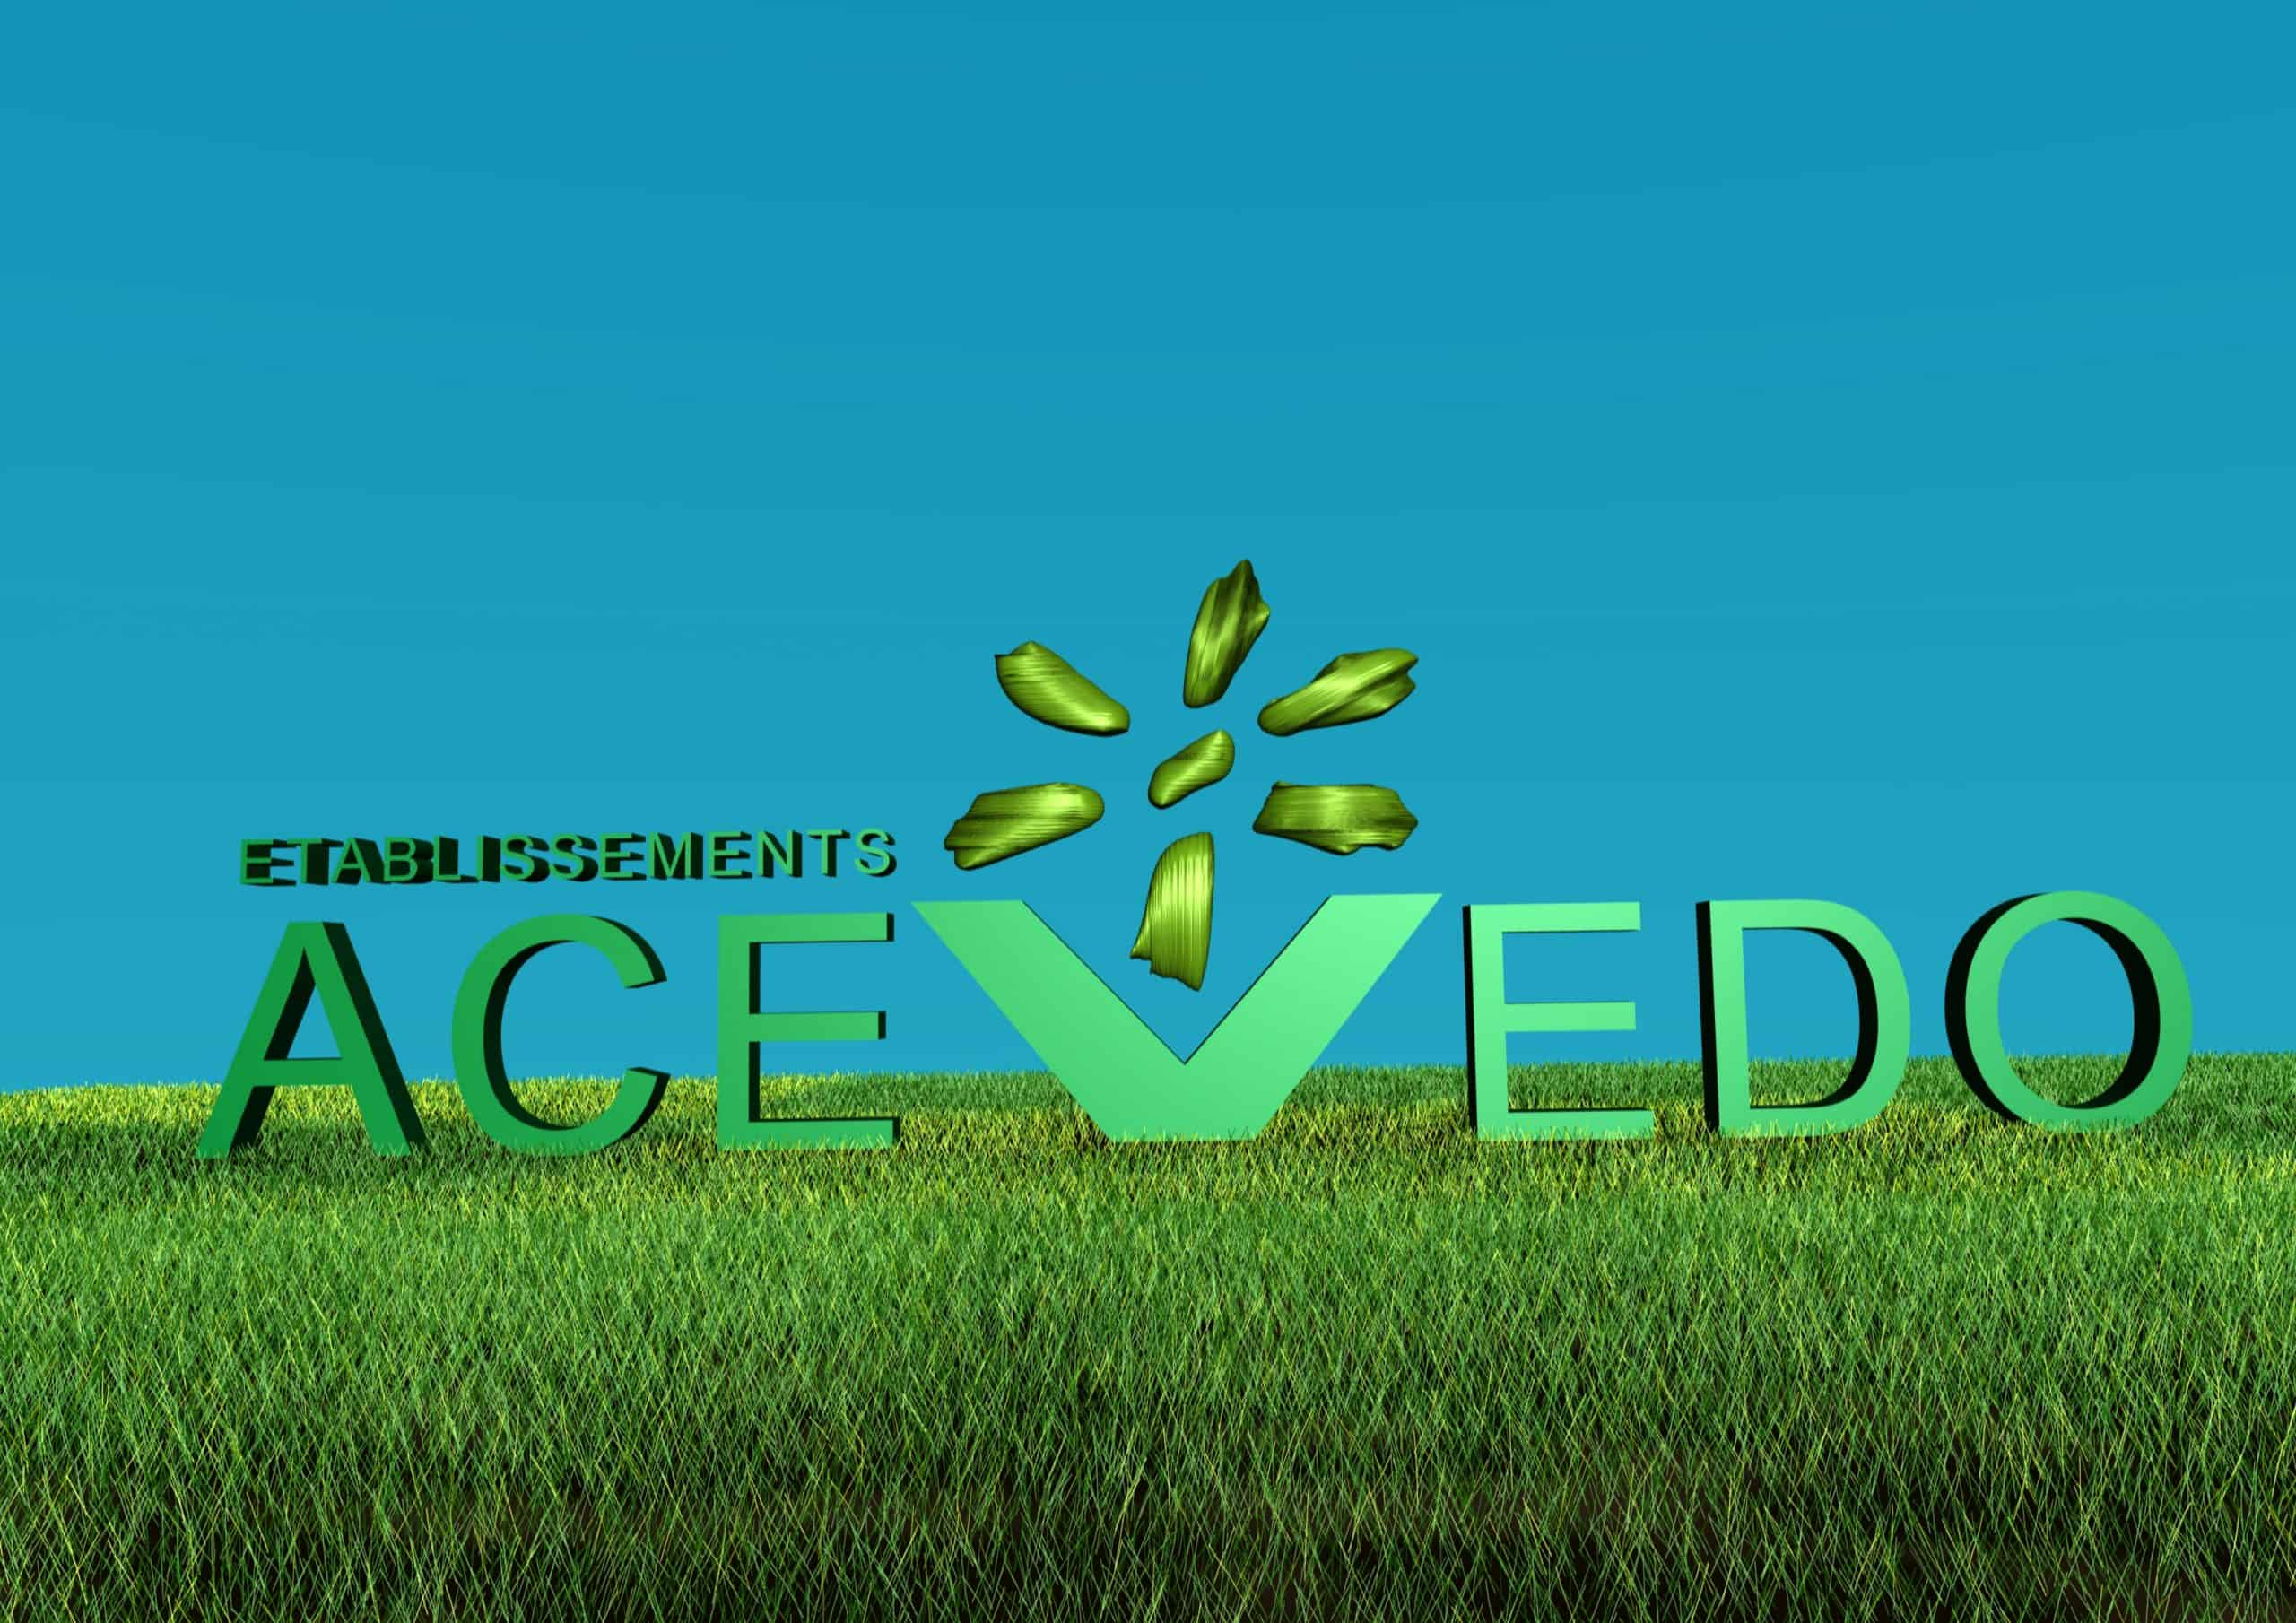 Logo ACEVEDO ETS